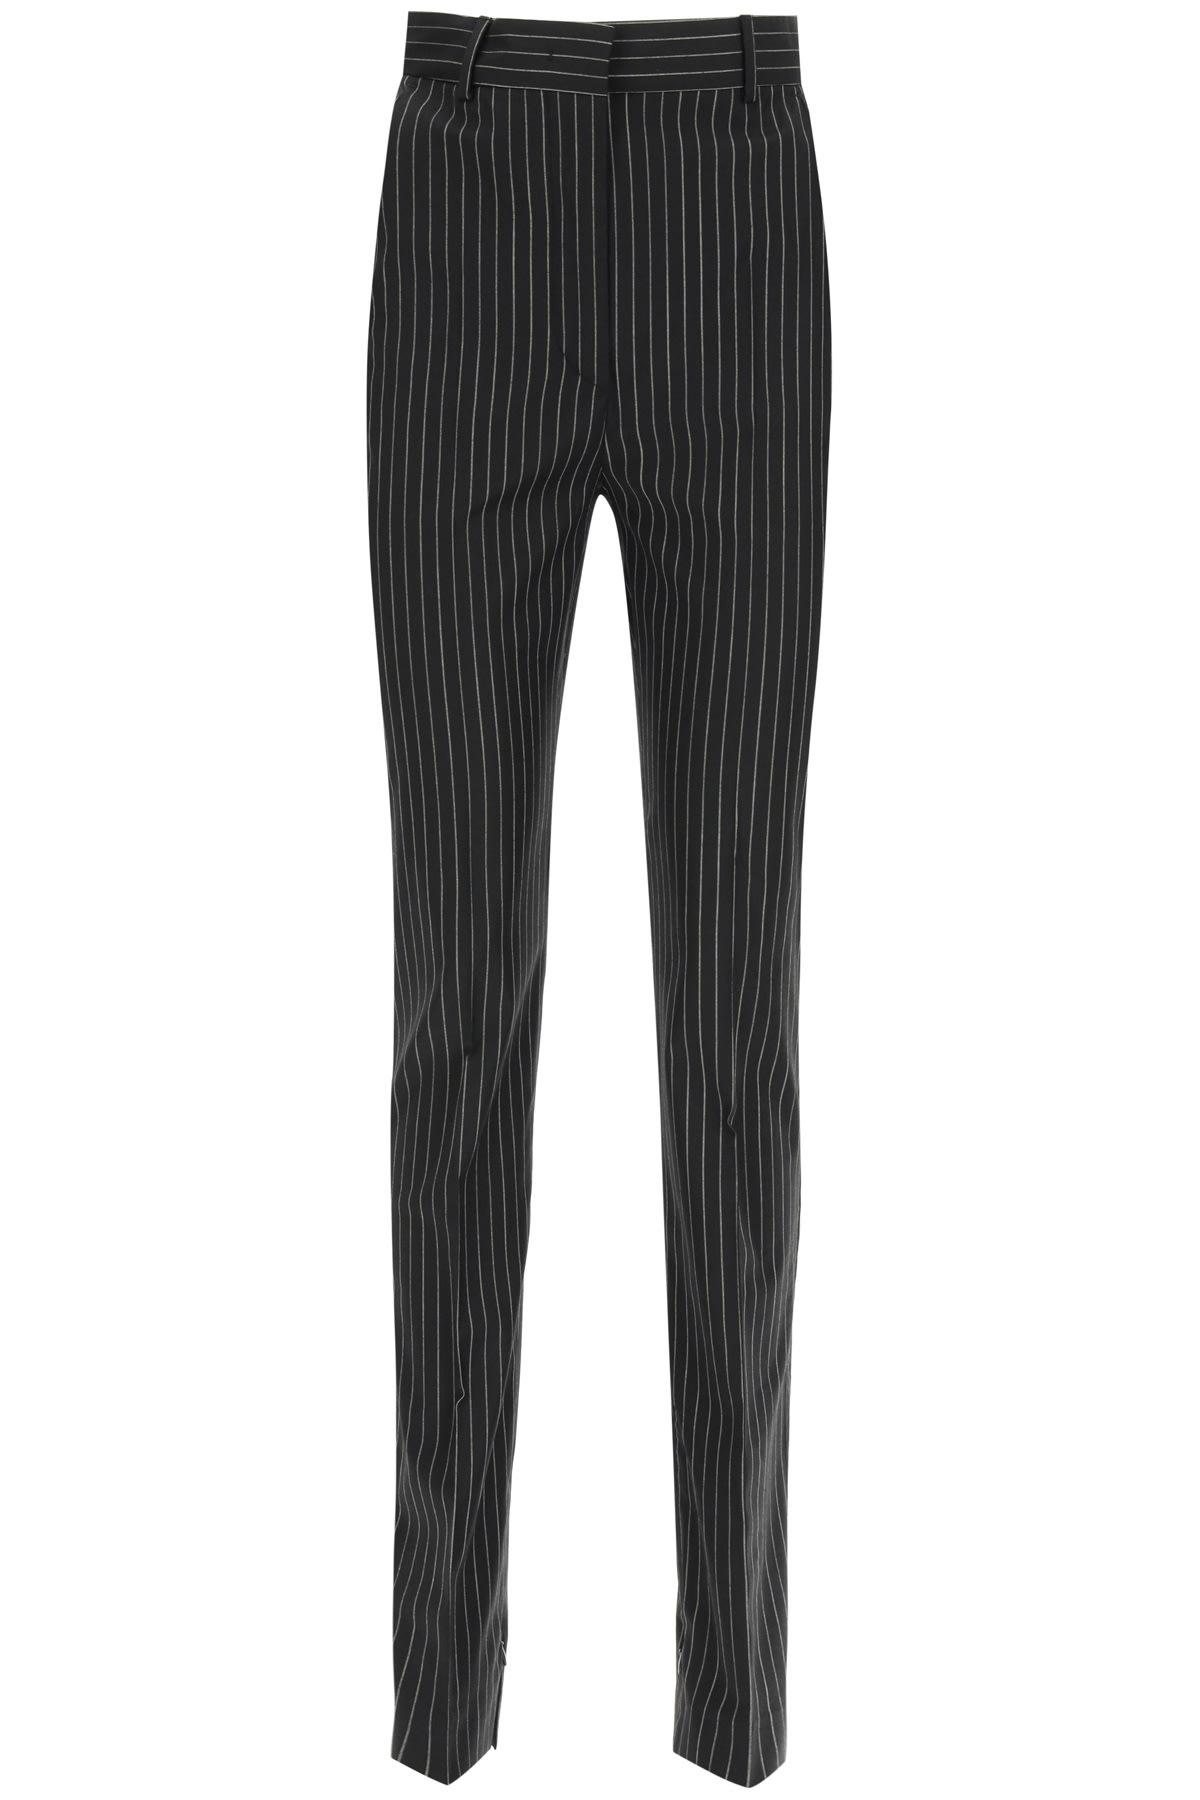 Sportmax Skinny pants LINCE PINSTRIPE TROUSERS